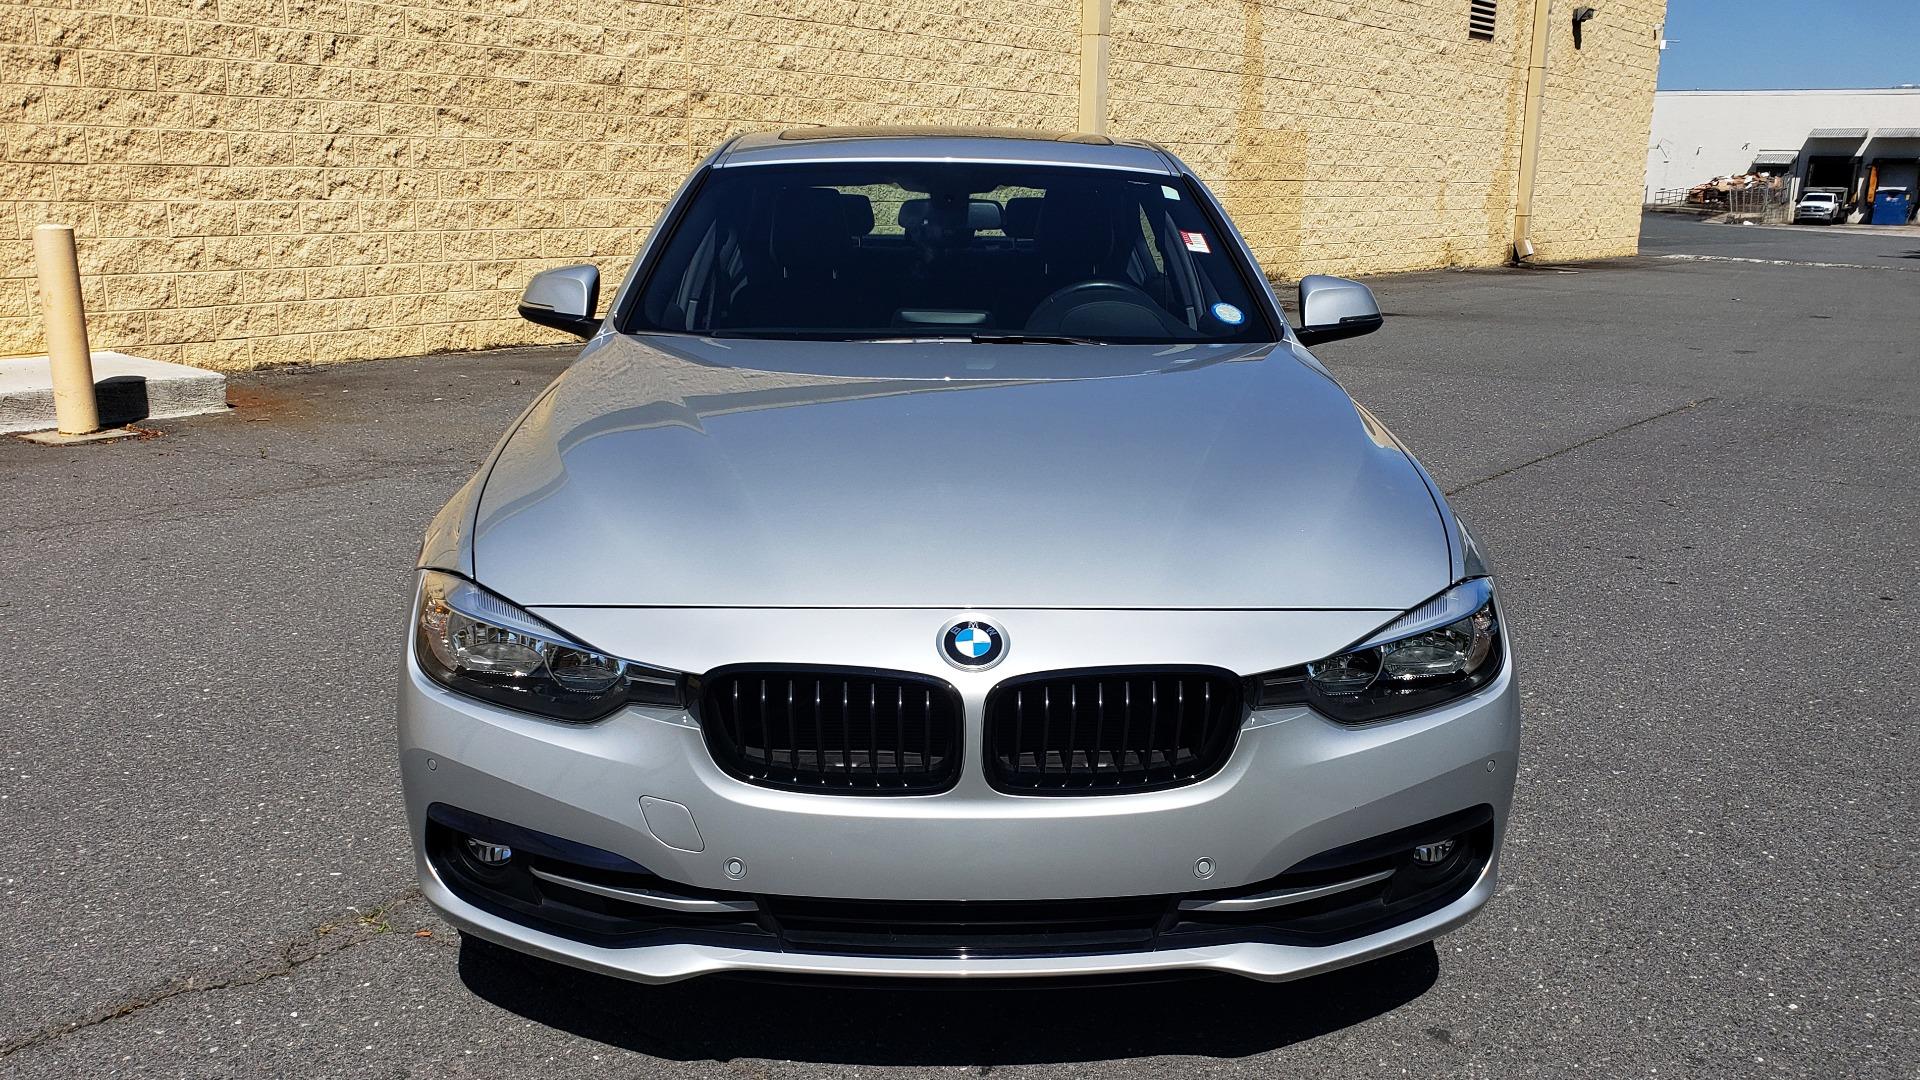 Used 2017 BMW 3 SERIES 330I SPORT SEDAN / DRVR ASST PKG / SUNROOF / REARVIEW for sale Sold at Formula Imports in Charlotte NC 28227 19